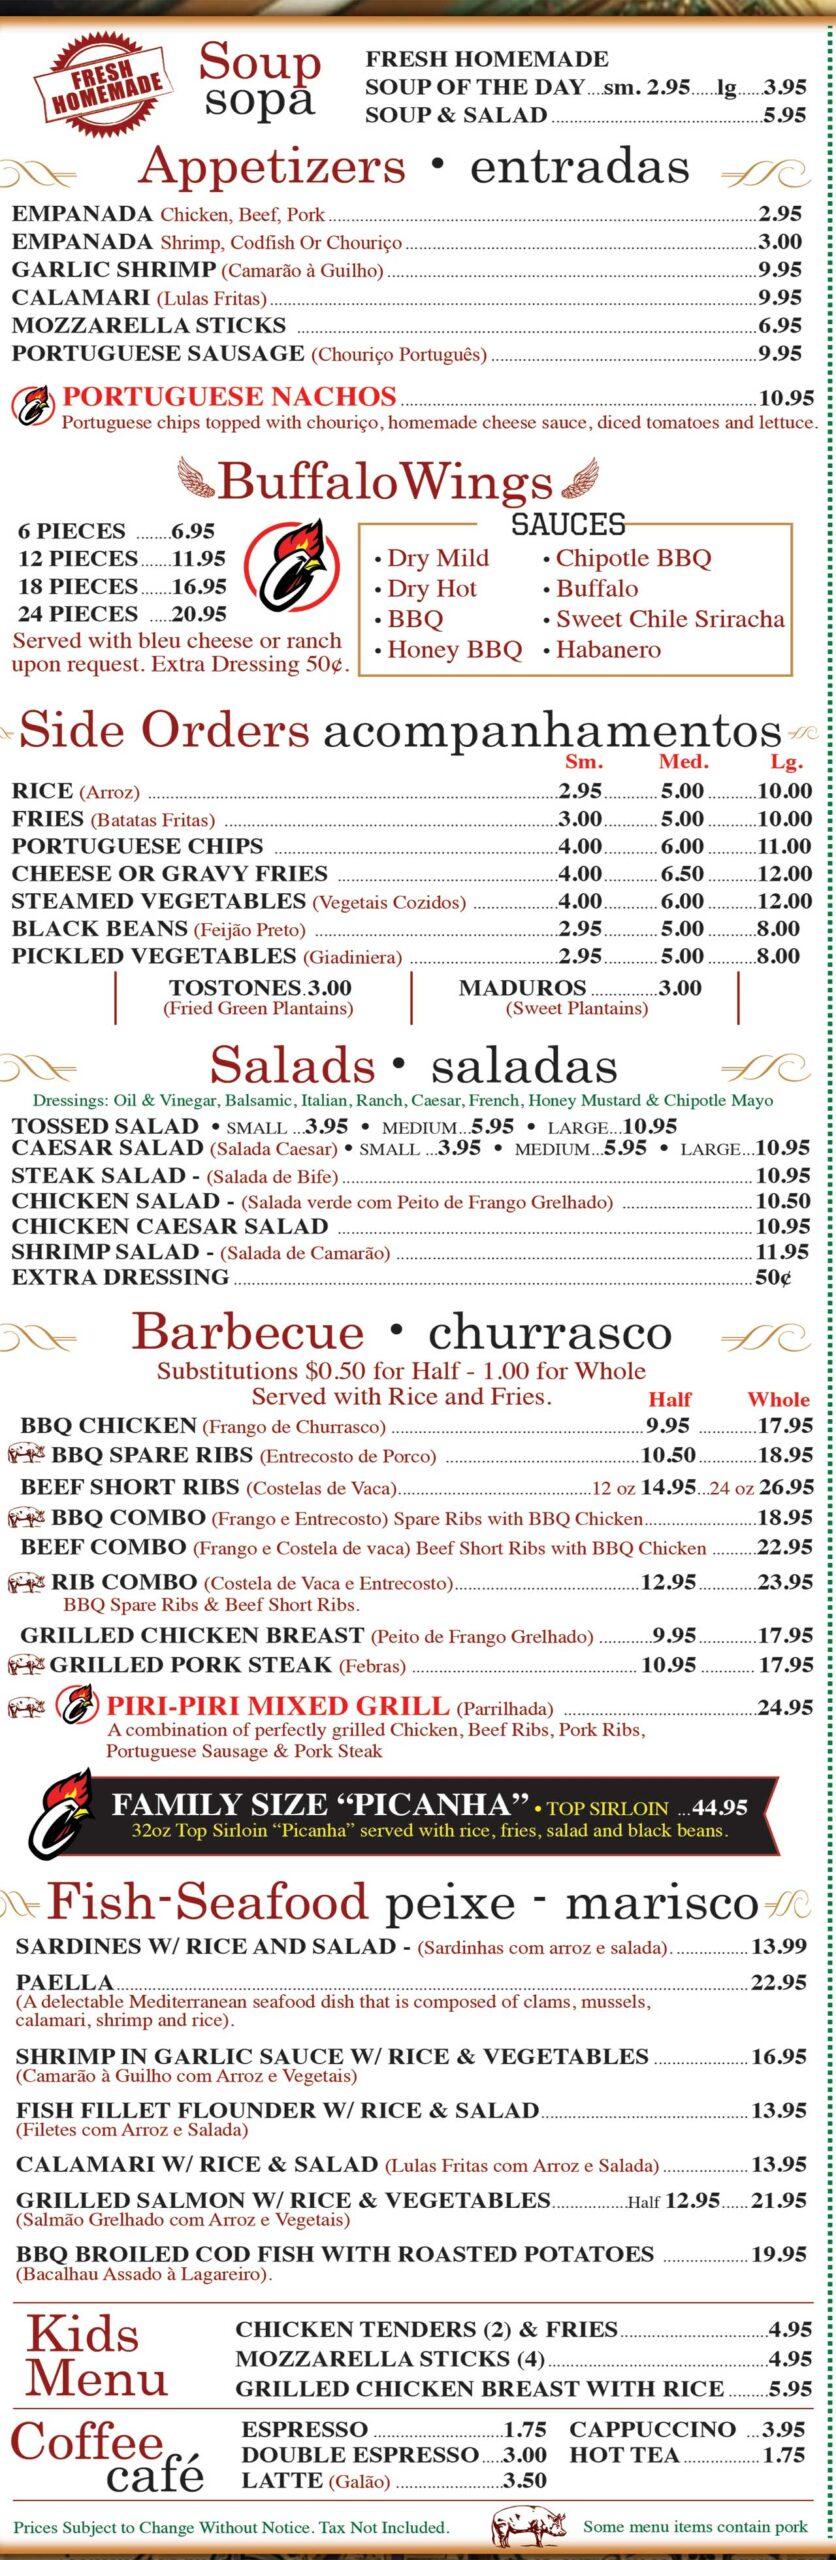 CravenBBQ-Menu-Linden-Lunch-Page1